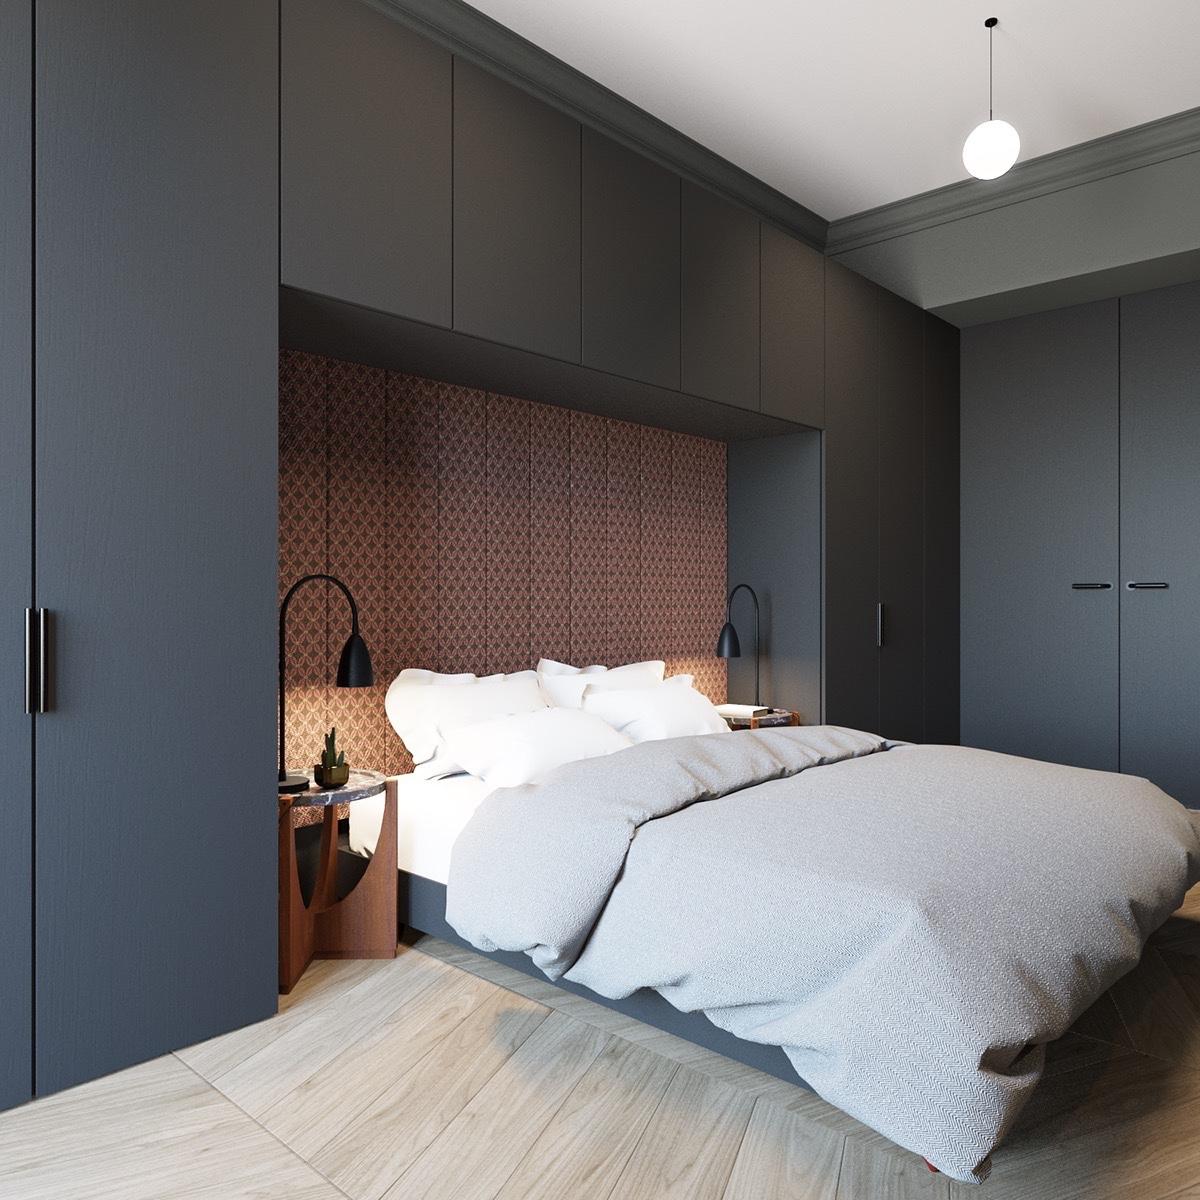 600 Square Feet Apartment Design With Wonderful Maximalist